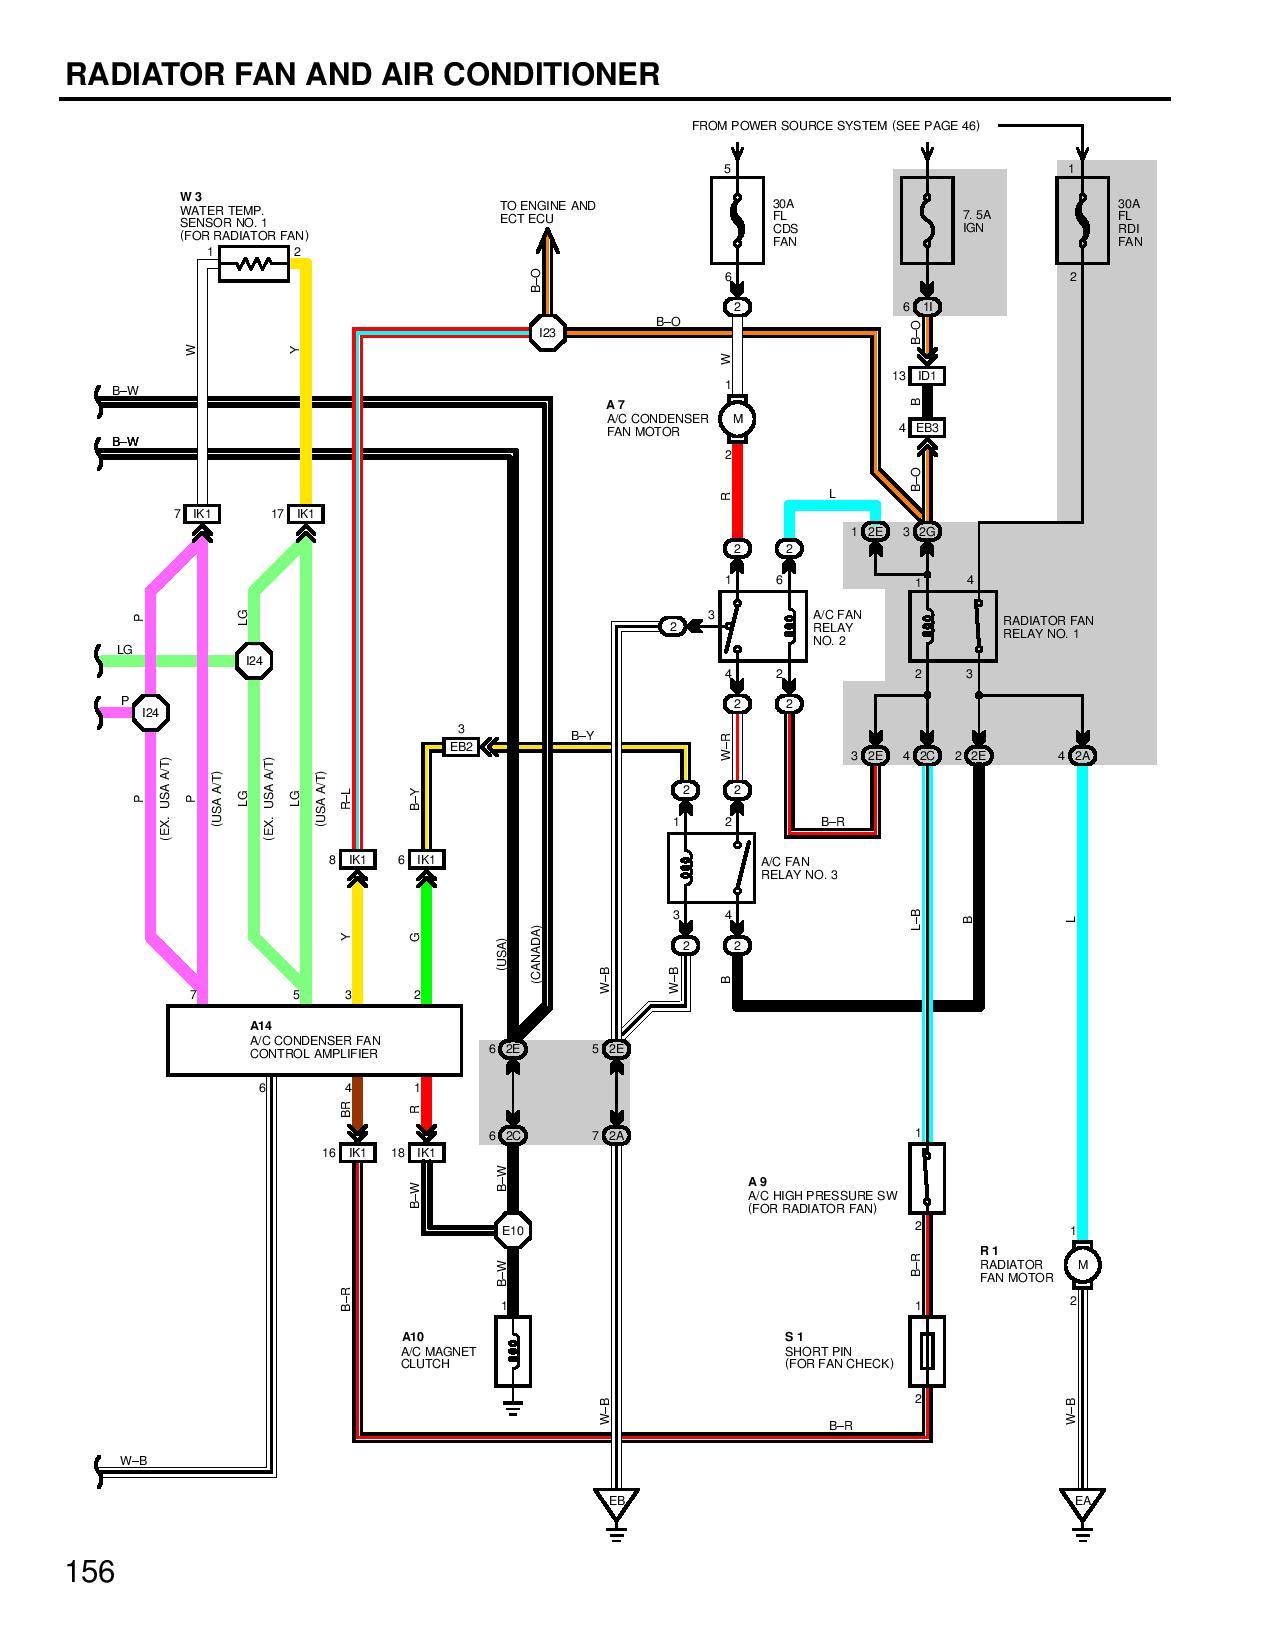 Toyota innova wiring diagram wiring diagram outstanding toyota lj radio wiring diagram pdf photos electrical toyota kijang innova wiring diagram toyota innova wiring diagram swarovskicordoba Images